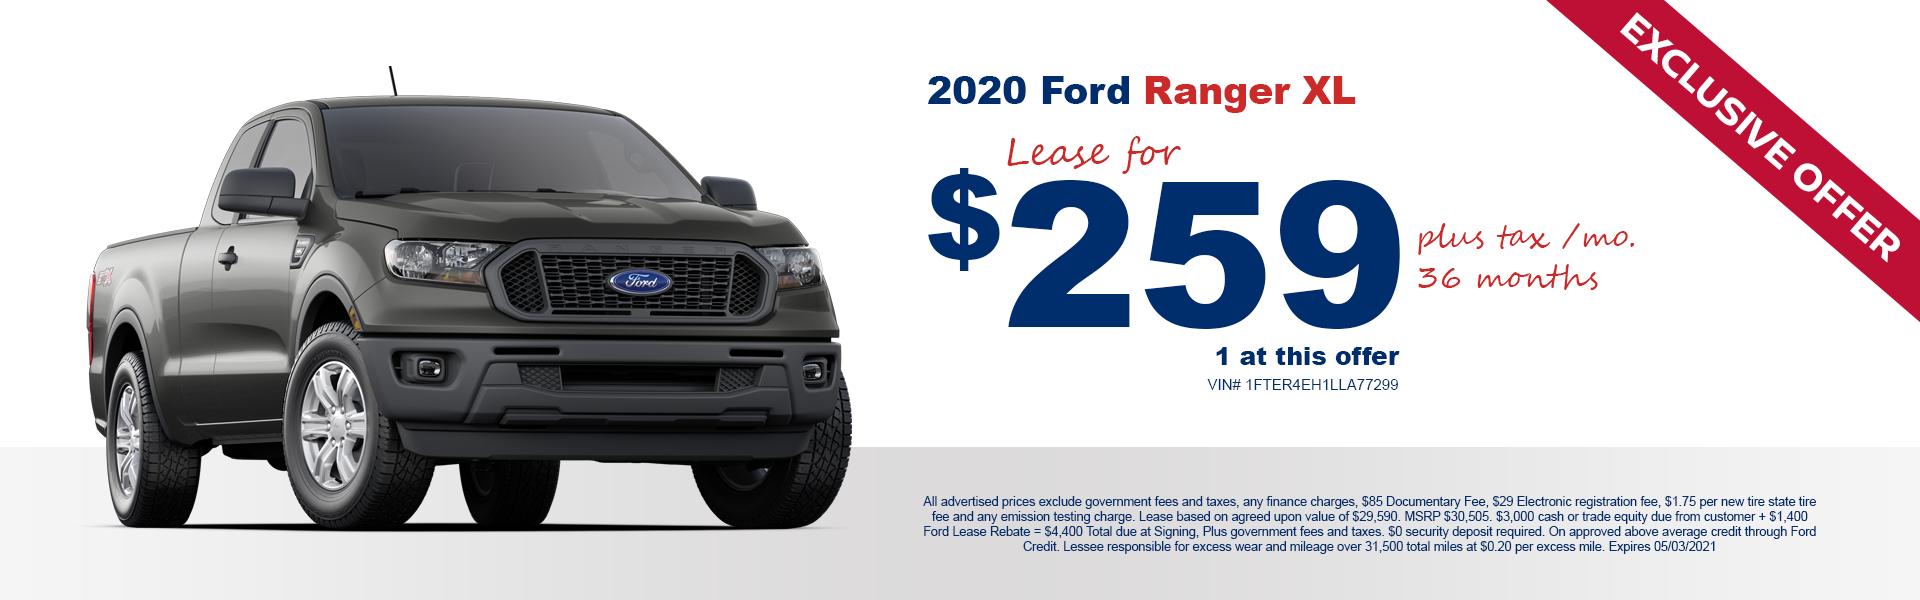 2020 Ranger Lease April 21